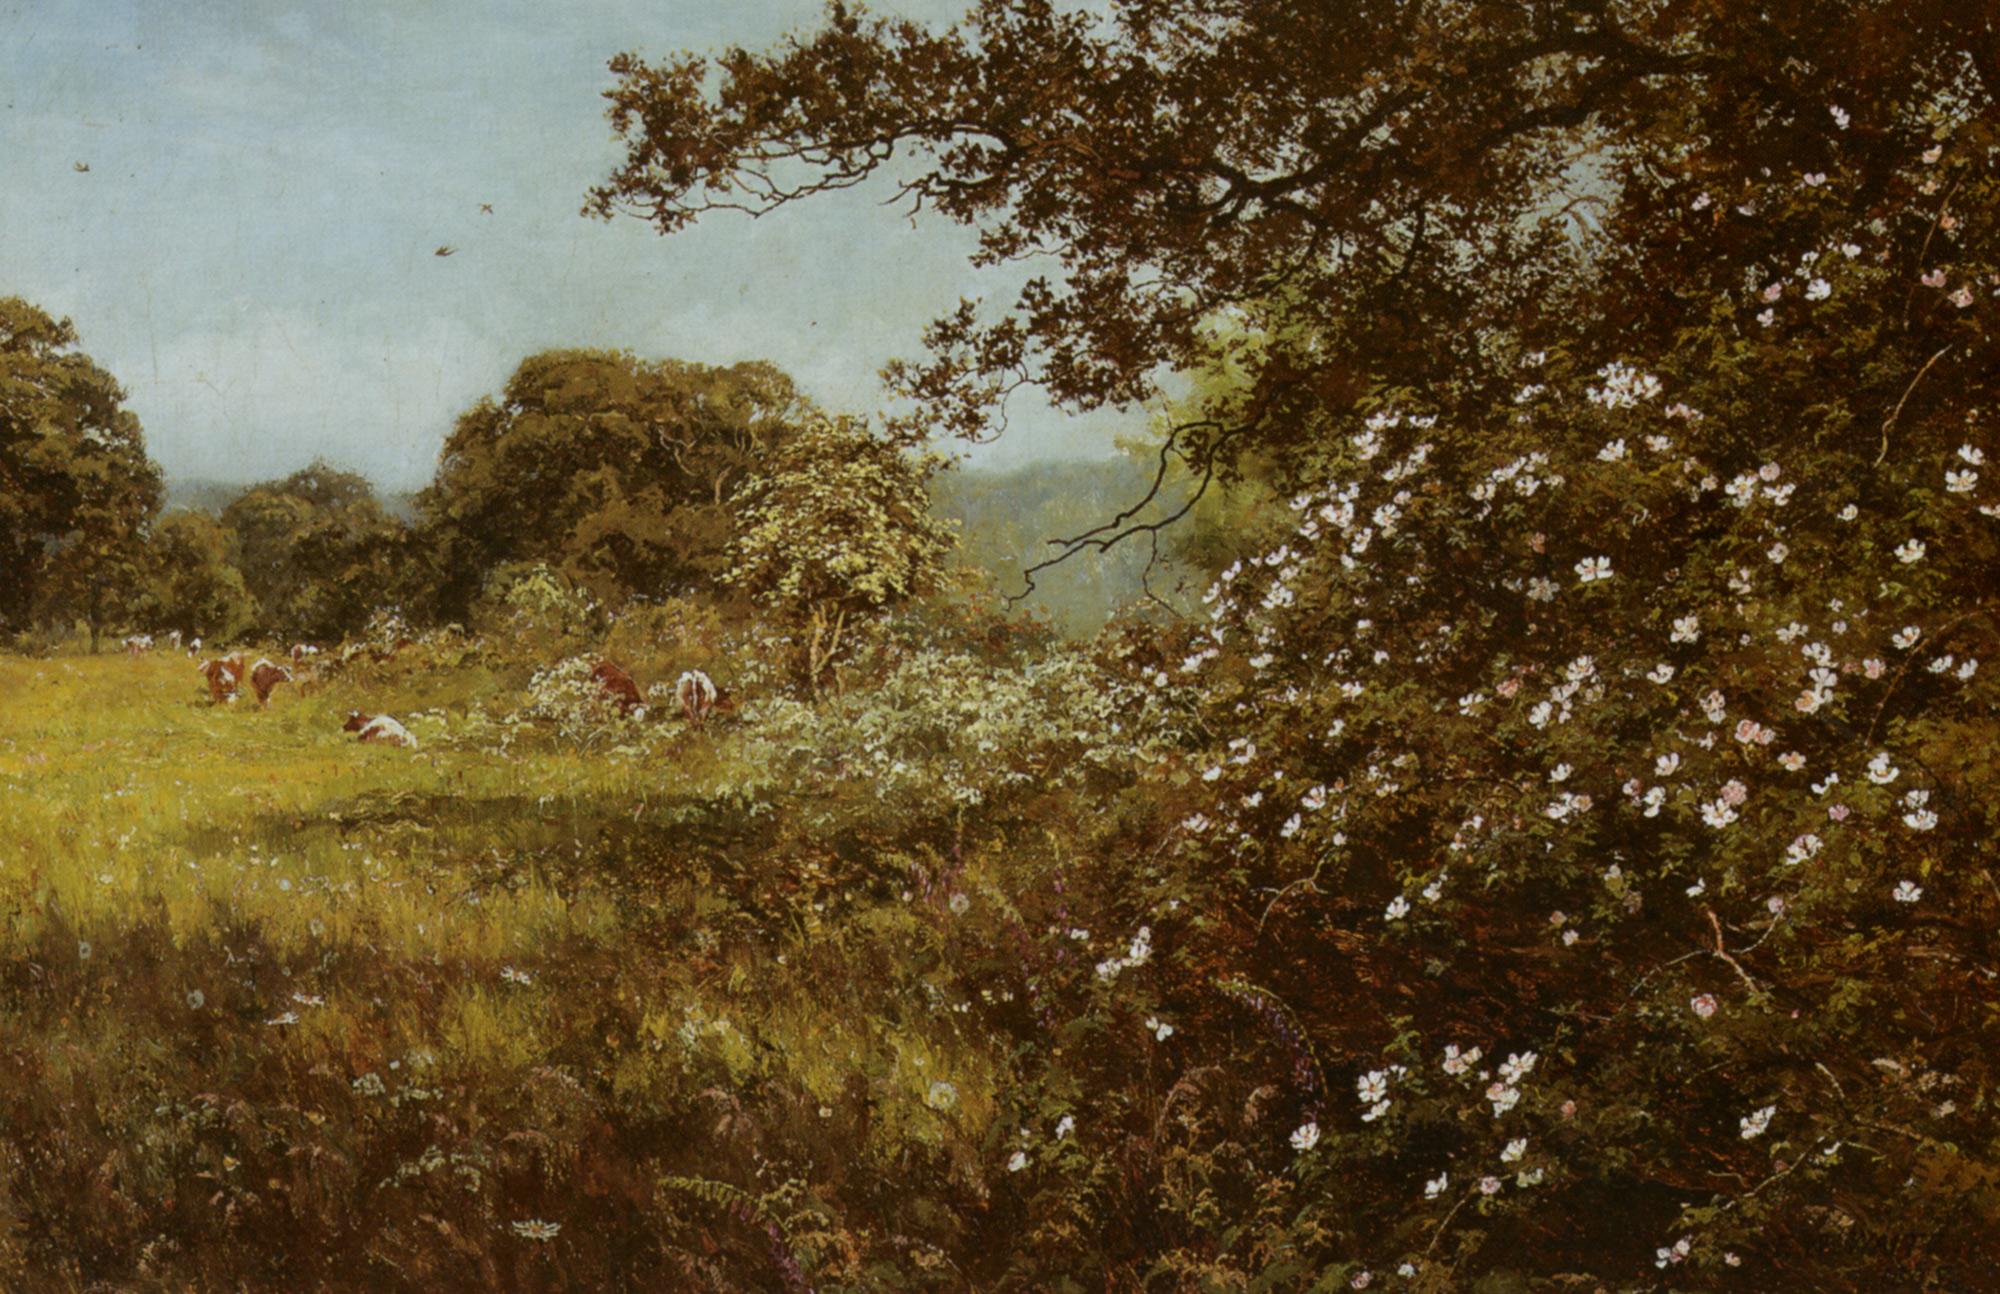 Early Summer :: Edward Wilkins Waite - Summer landscapes and gardens ôîòî